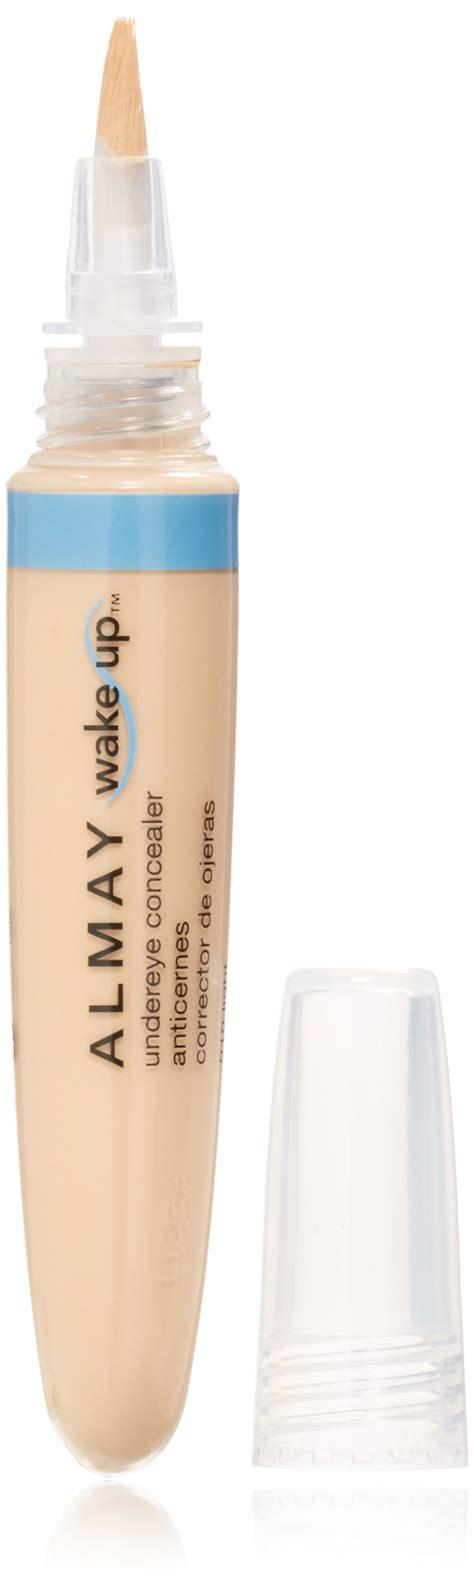 almay line smoothing concealer light 100 amazon com almay clear complexion concealer corrector